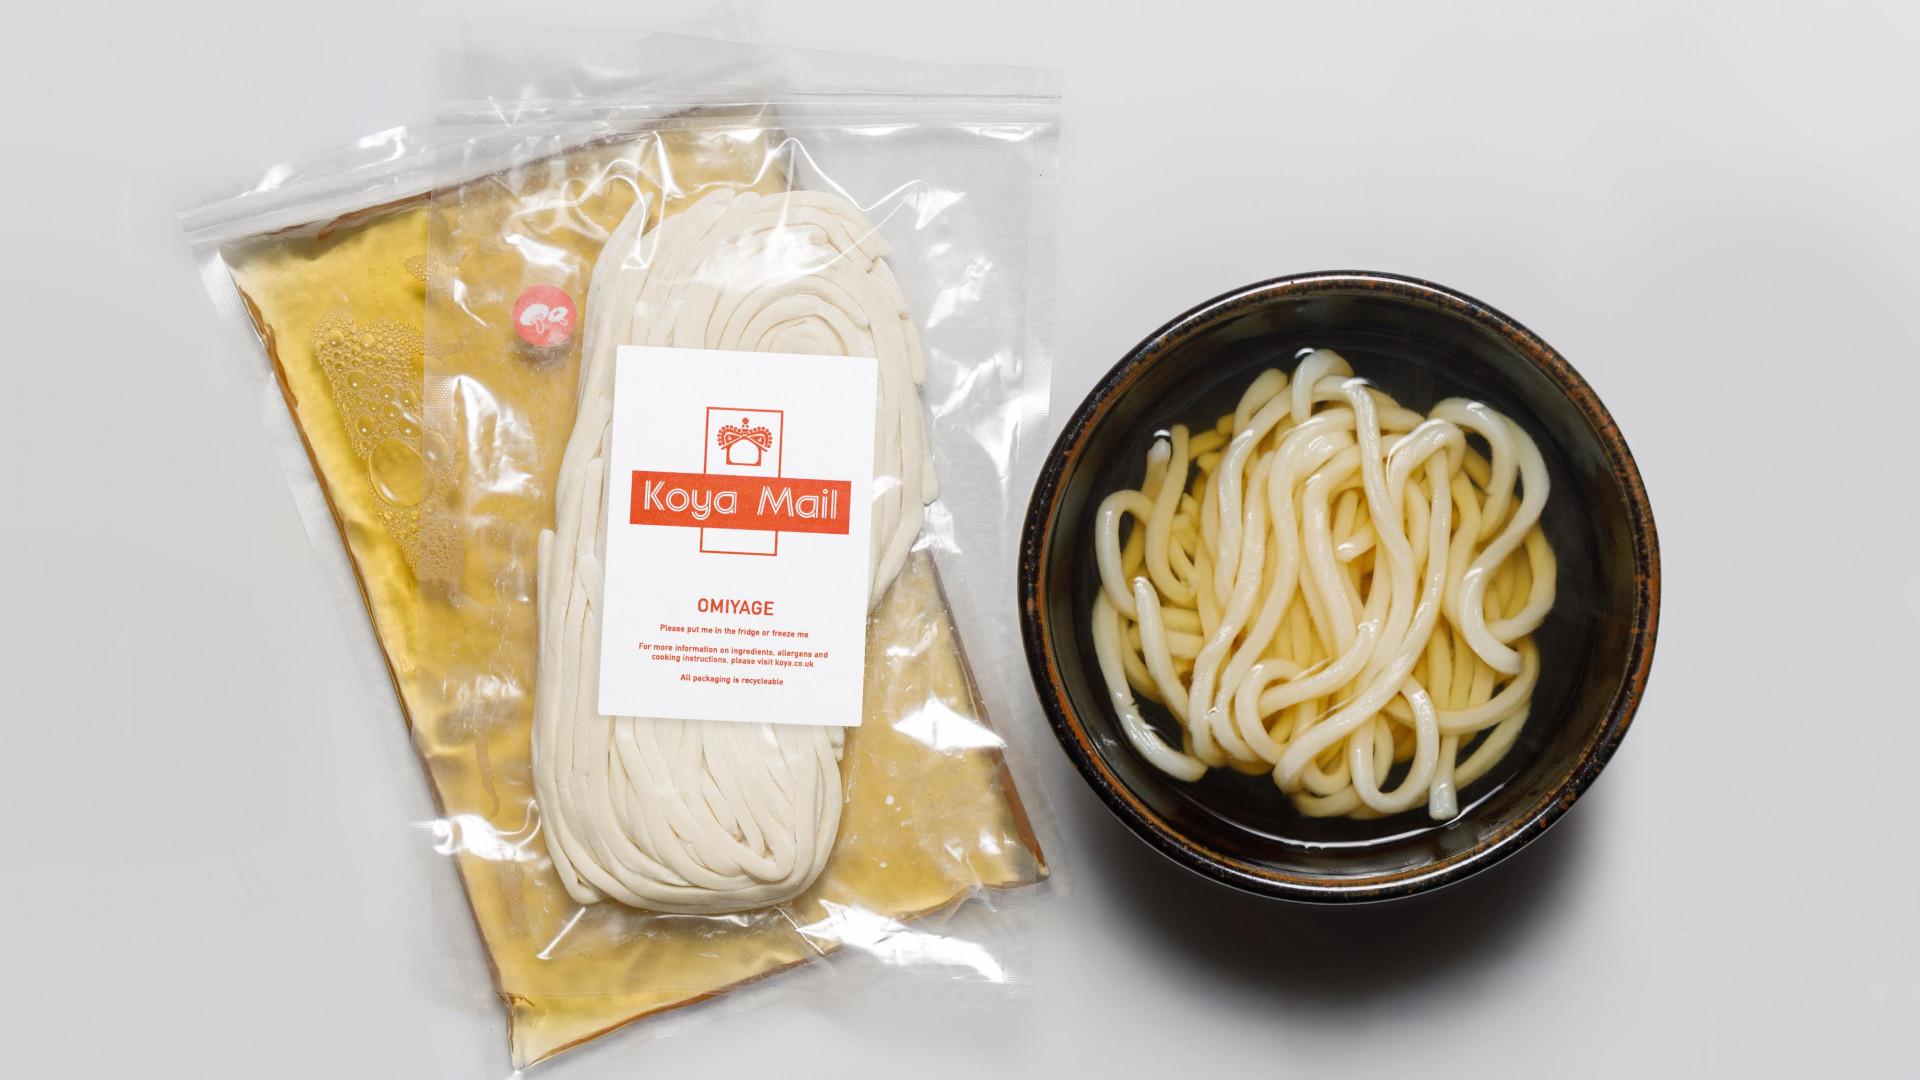 A photo of Koya's 'Koya Mail' dashi and udon noodle 'Omiyage' delivery box